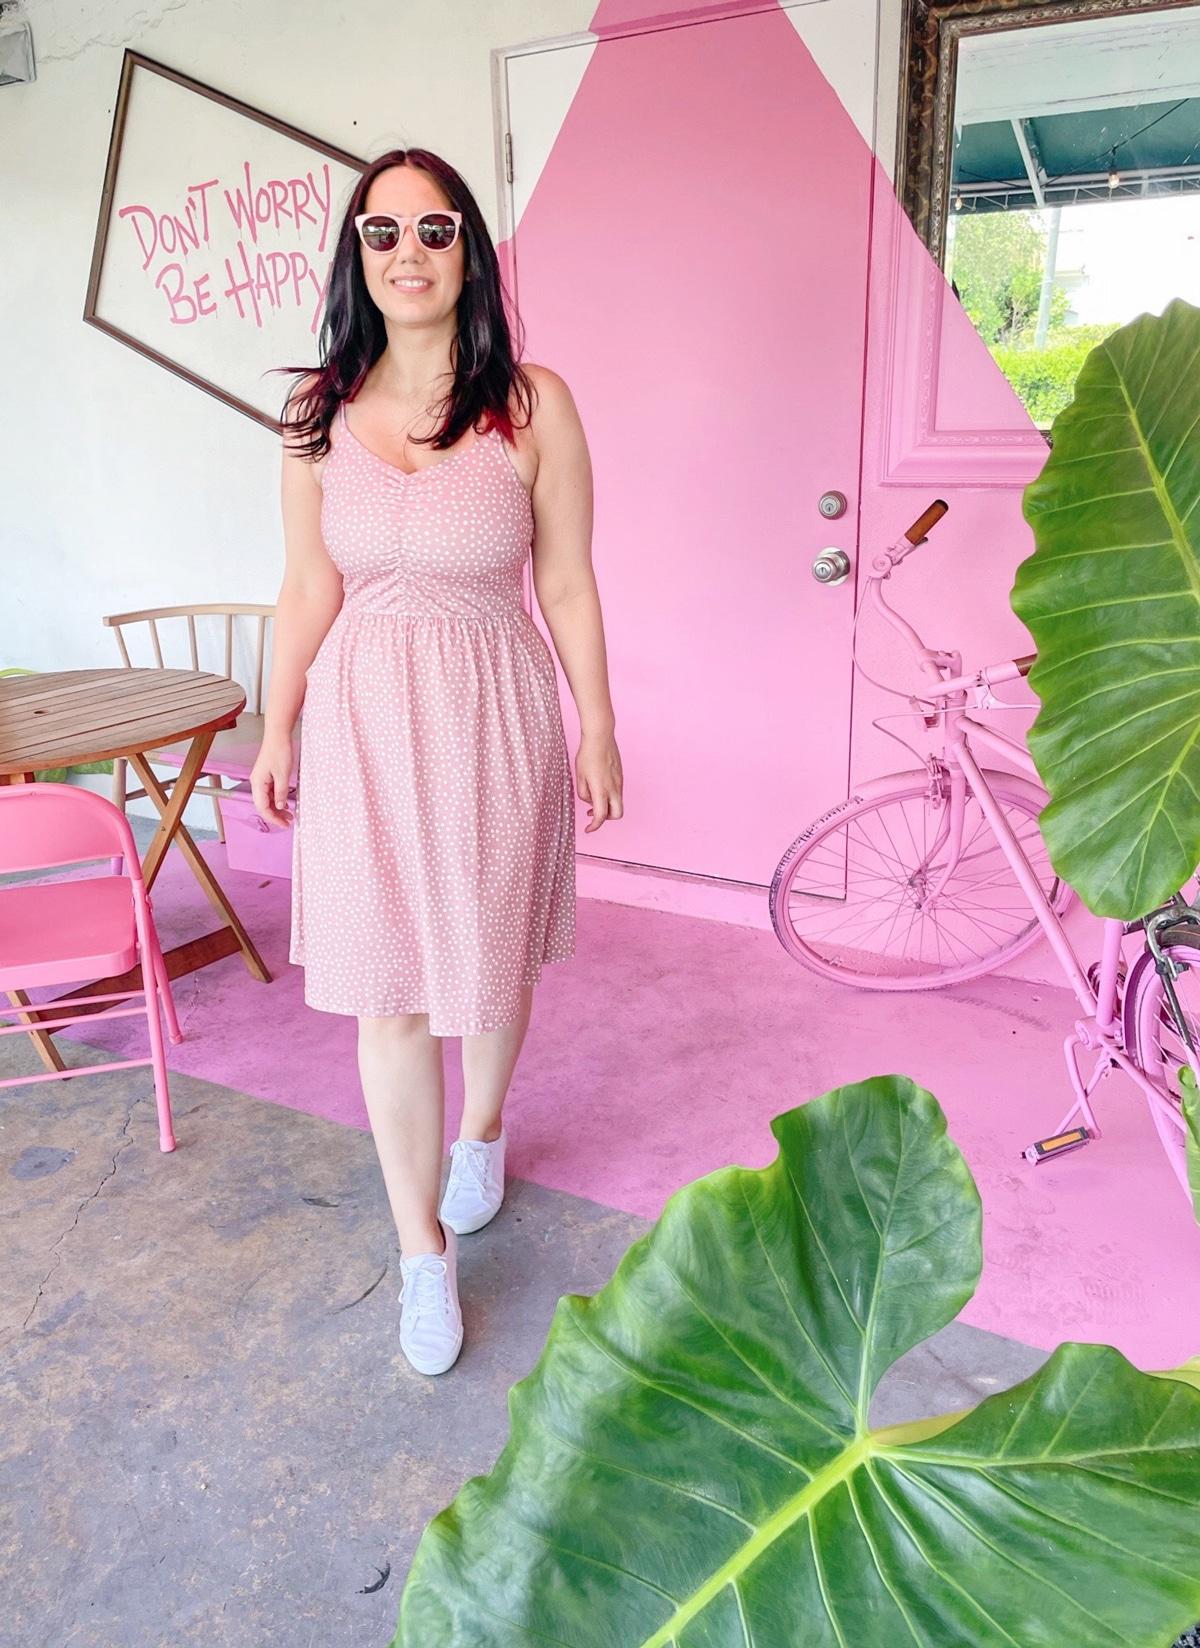 Cafe Kush MiMo Miami Historic District Hidden Gem REstaurant for Brunch